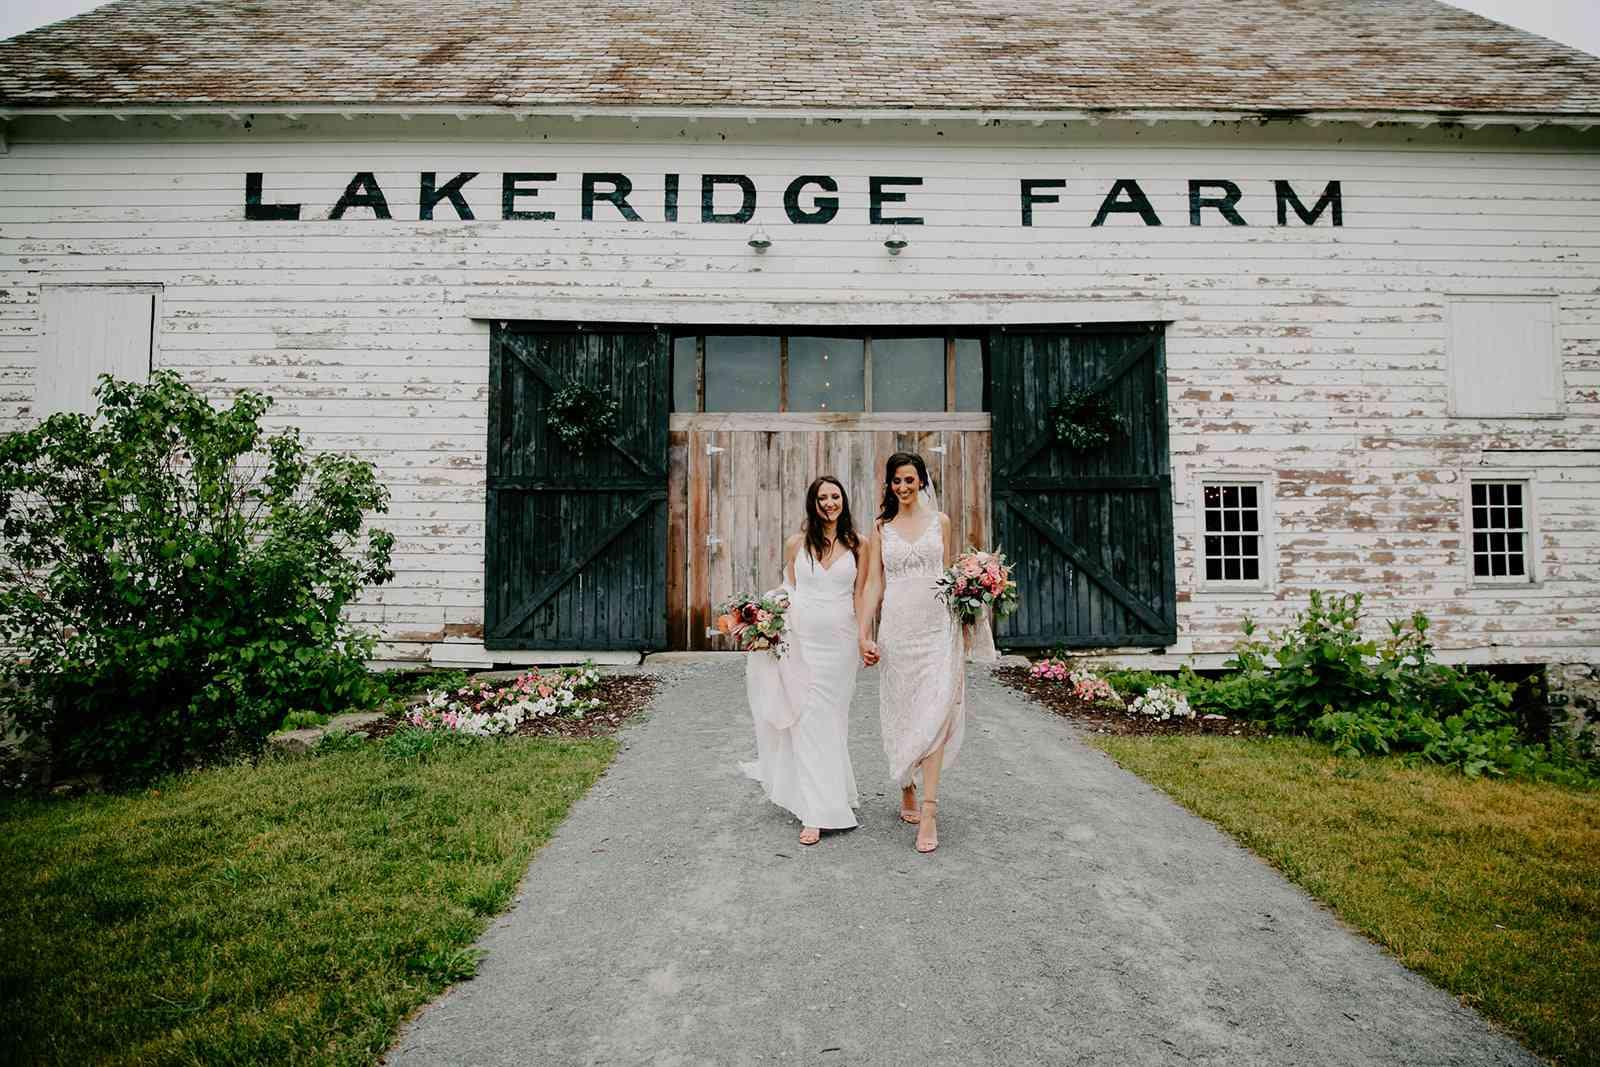 brides holding hands